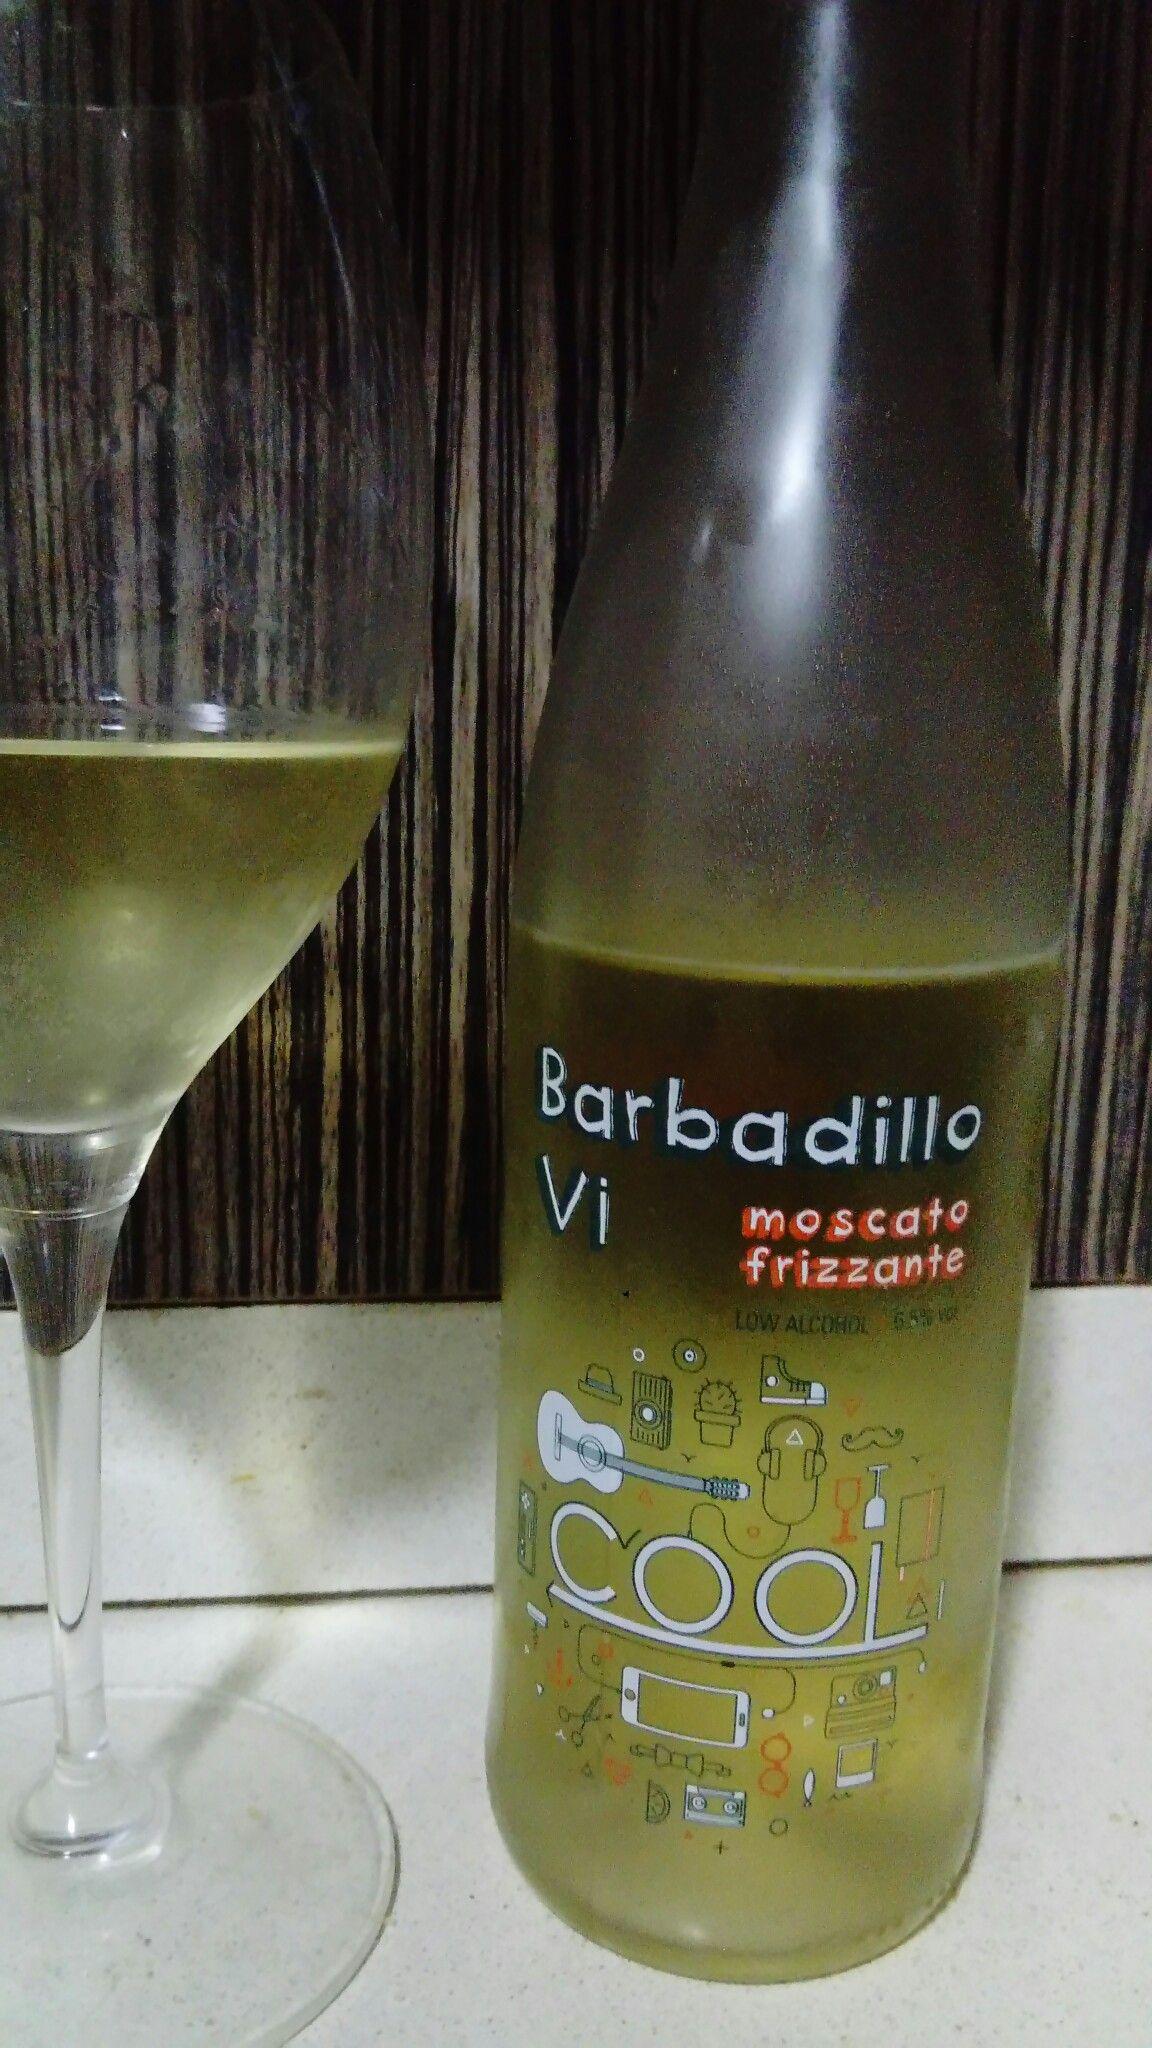 Barbadillo Aroma Ligero A Citricos Flores Y Lichis Dulce Ideal